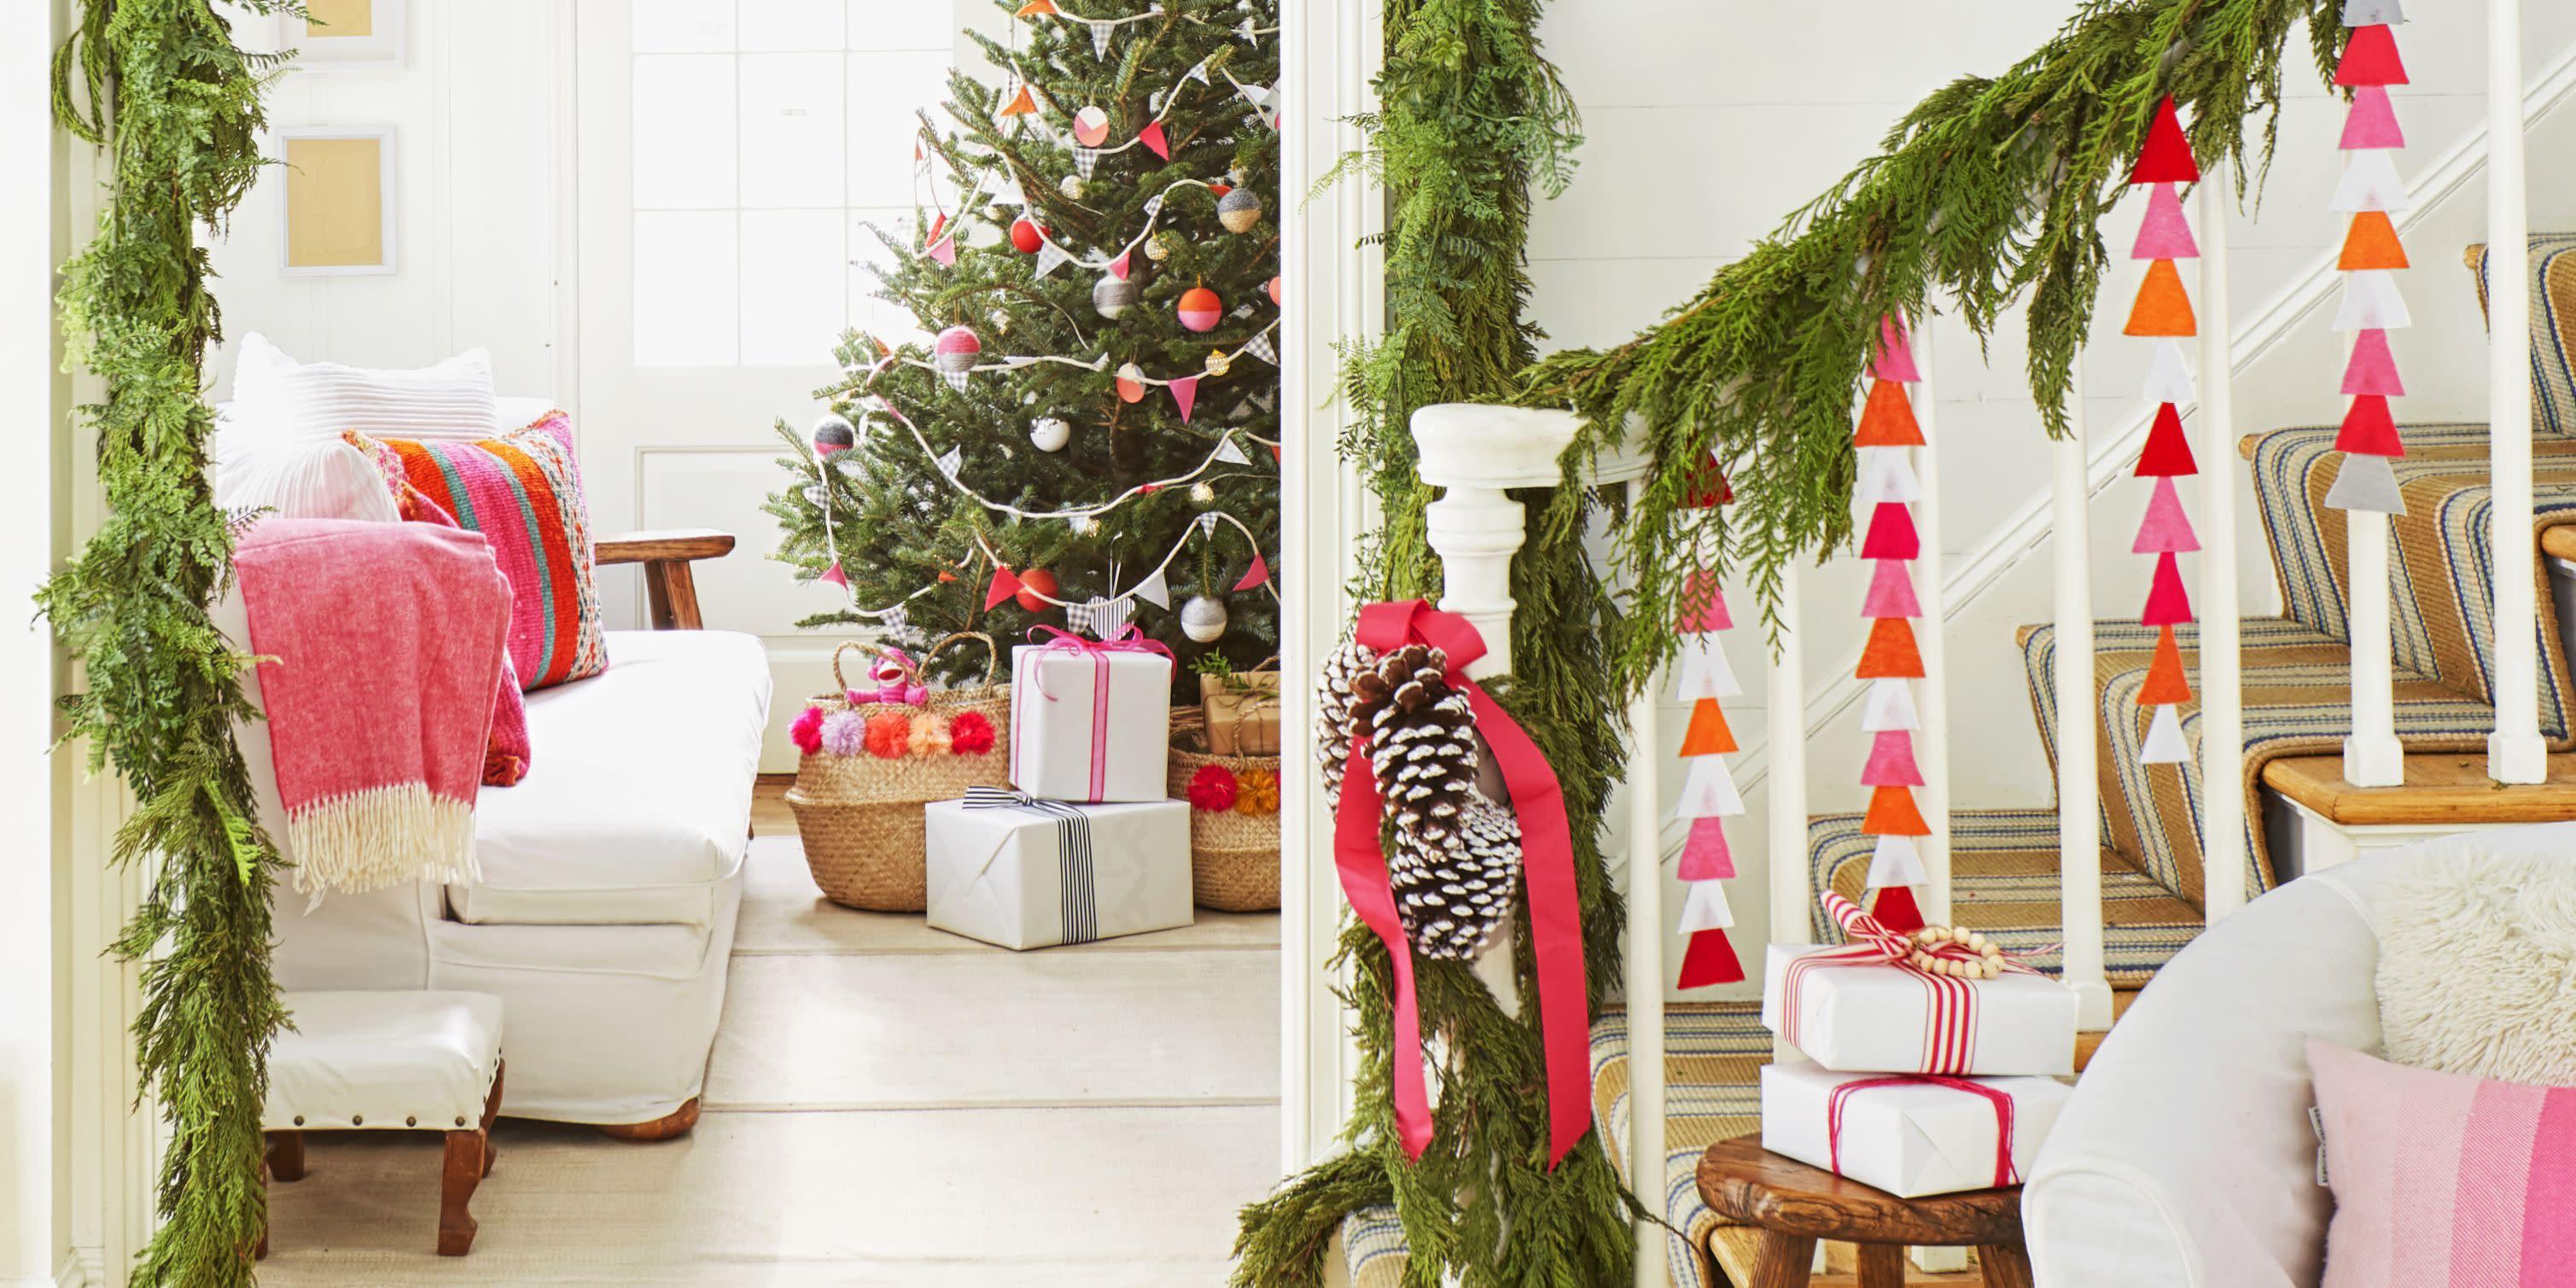 House Into A Winter Wonderland